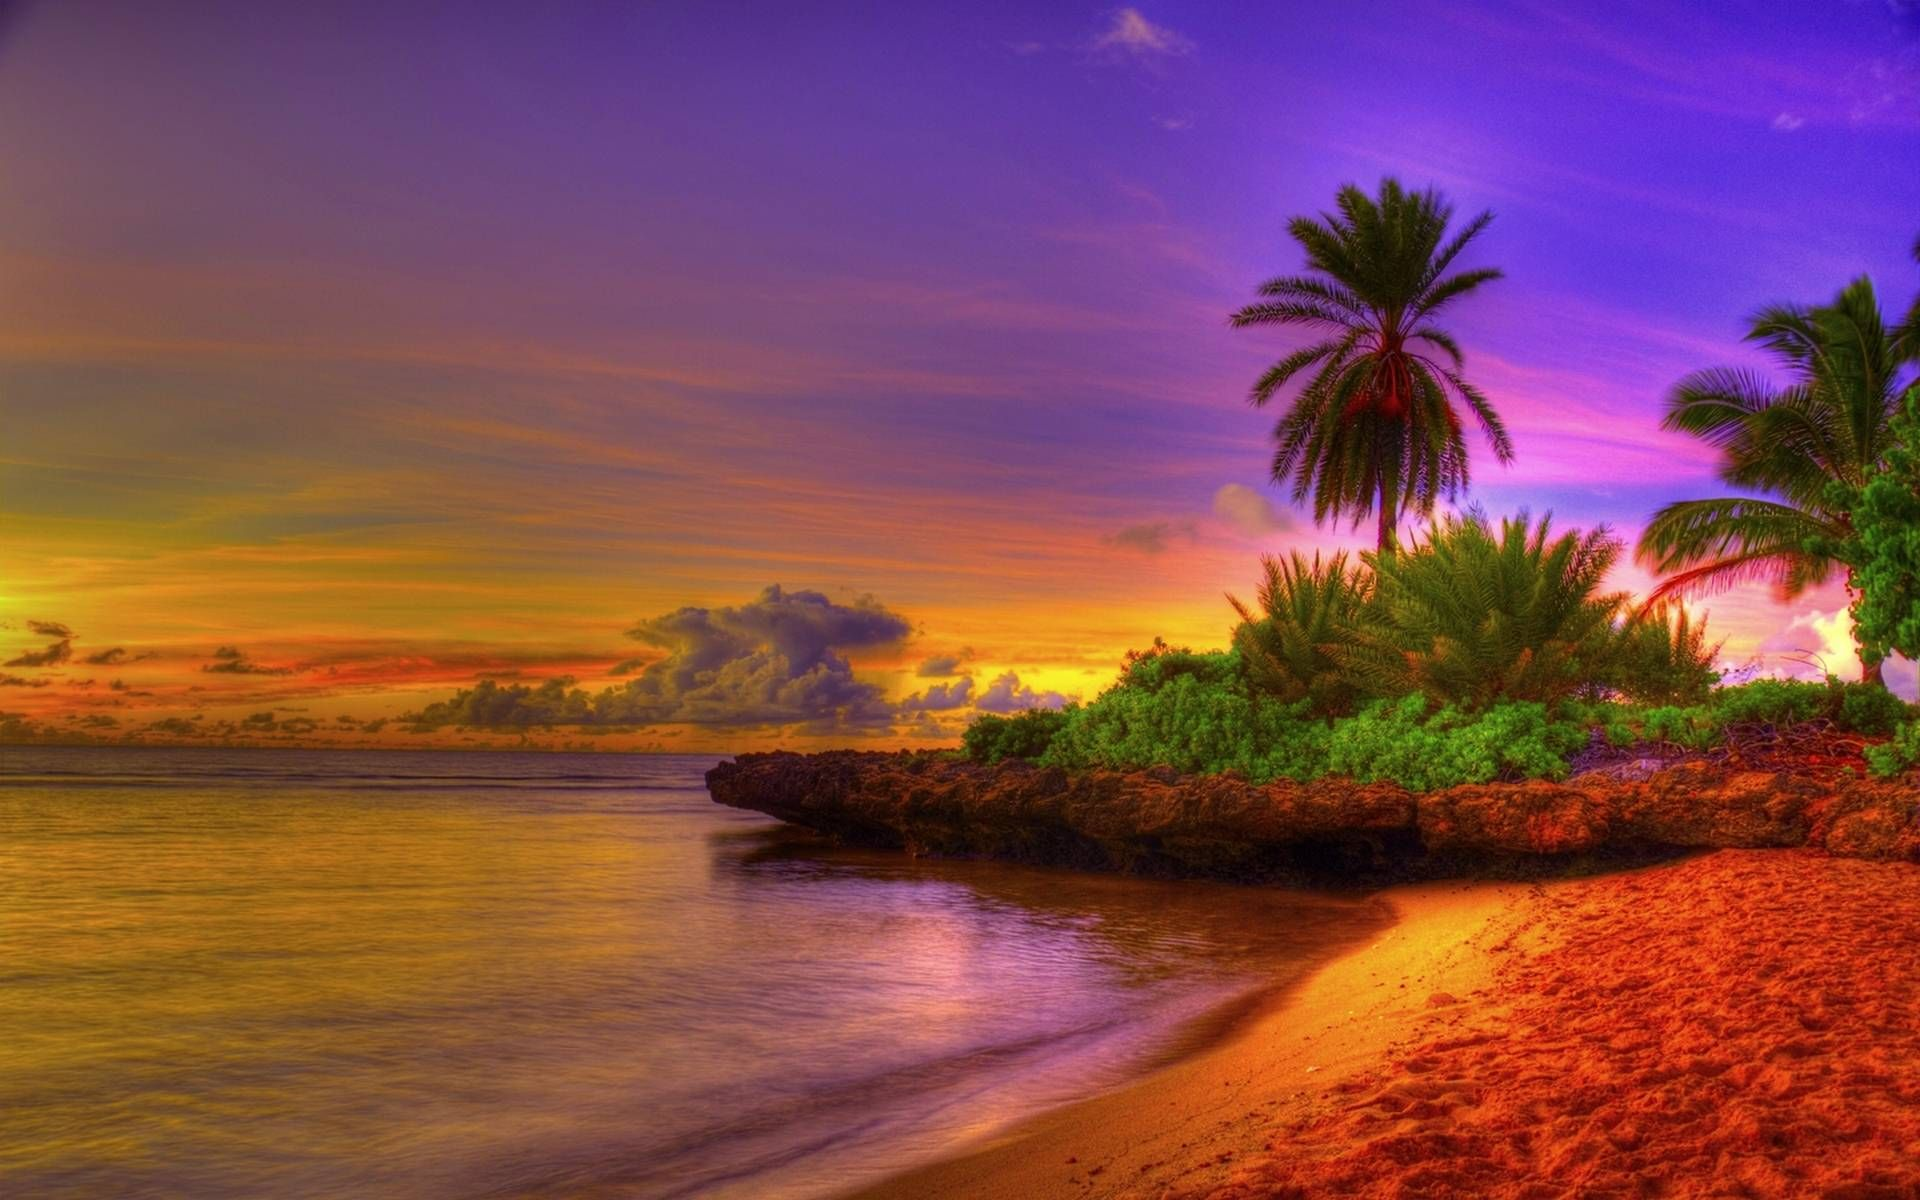 Tropical Beach Sunrise Hd Cool 7 HD Wallpapers amagico